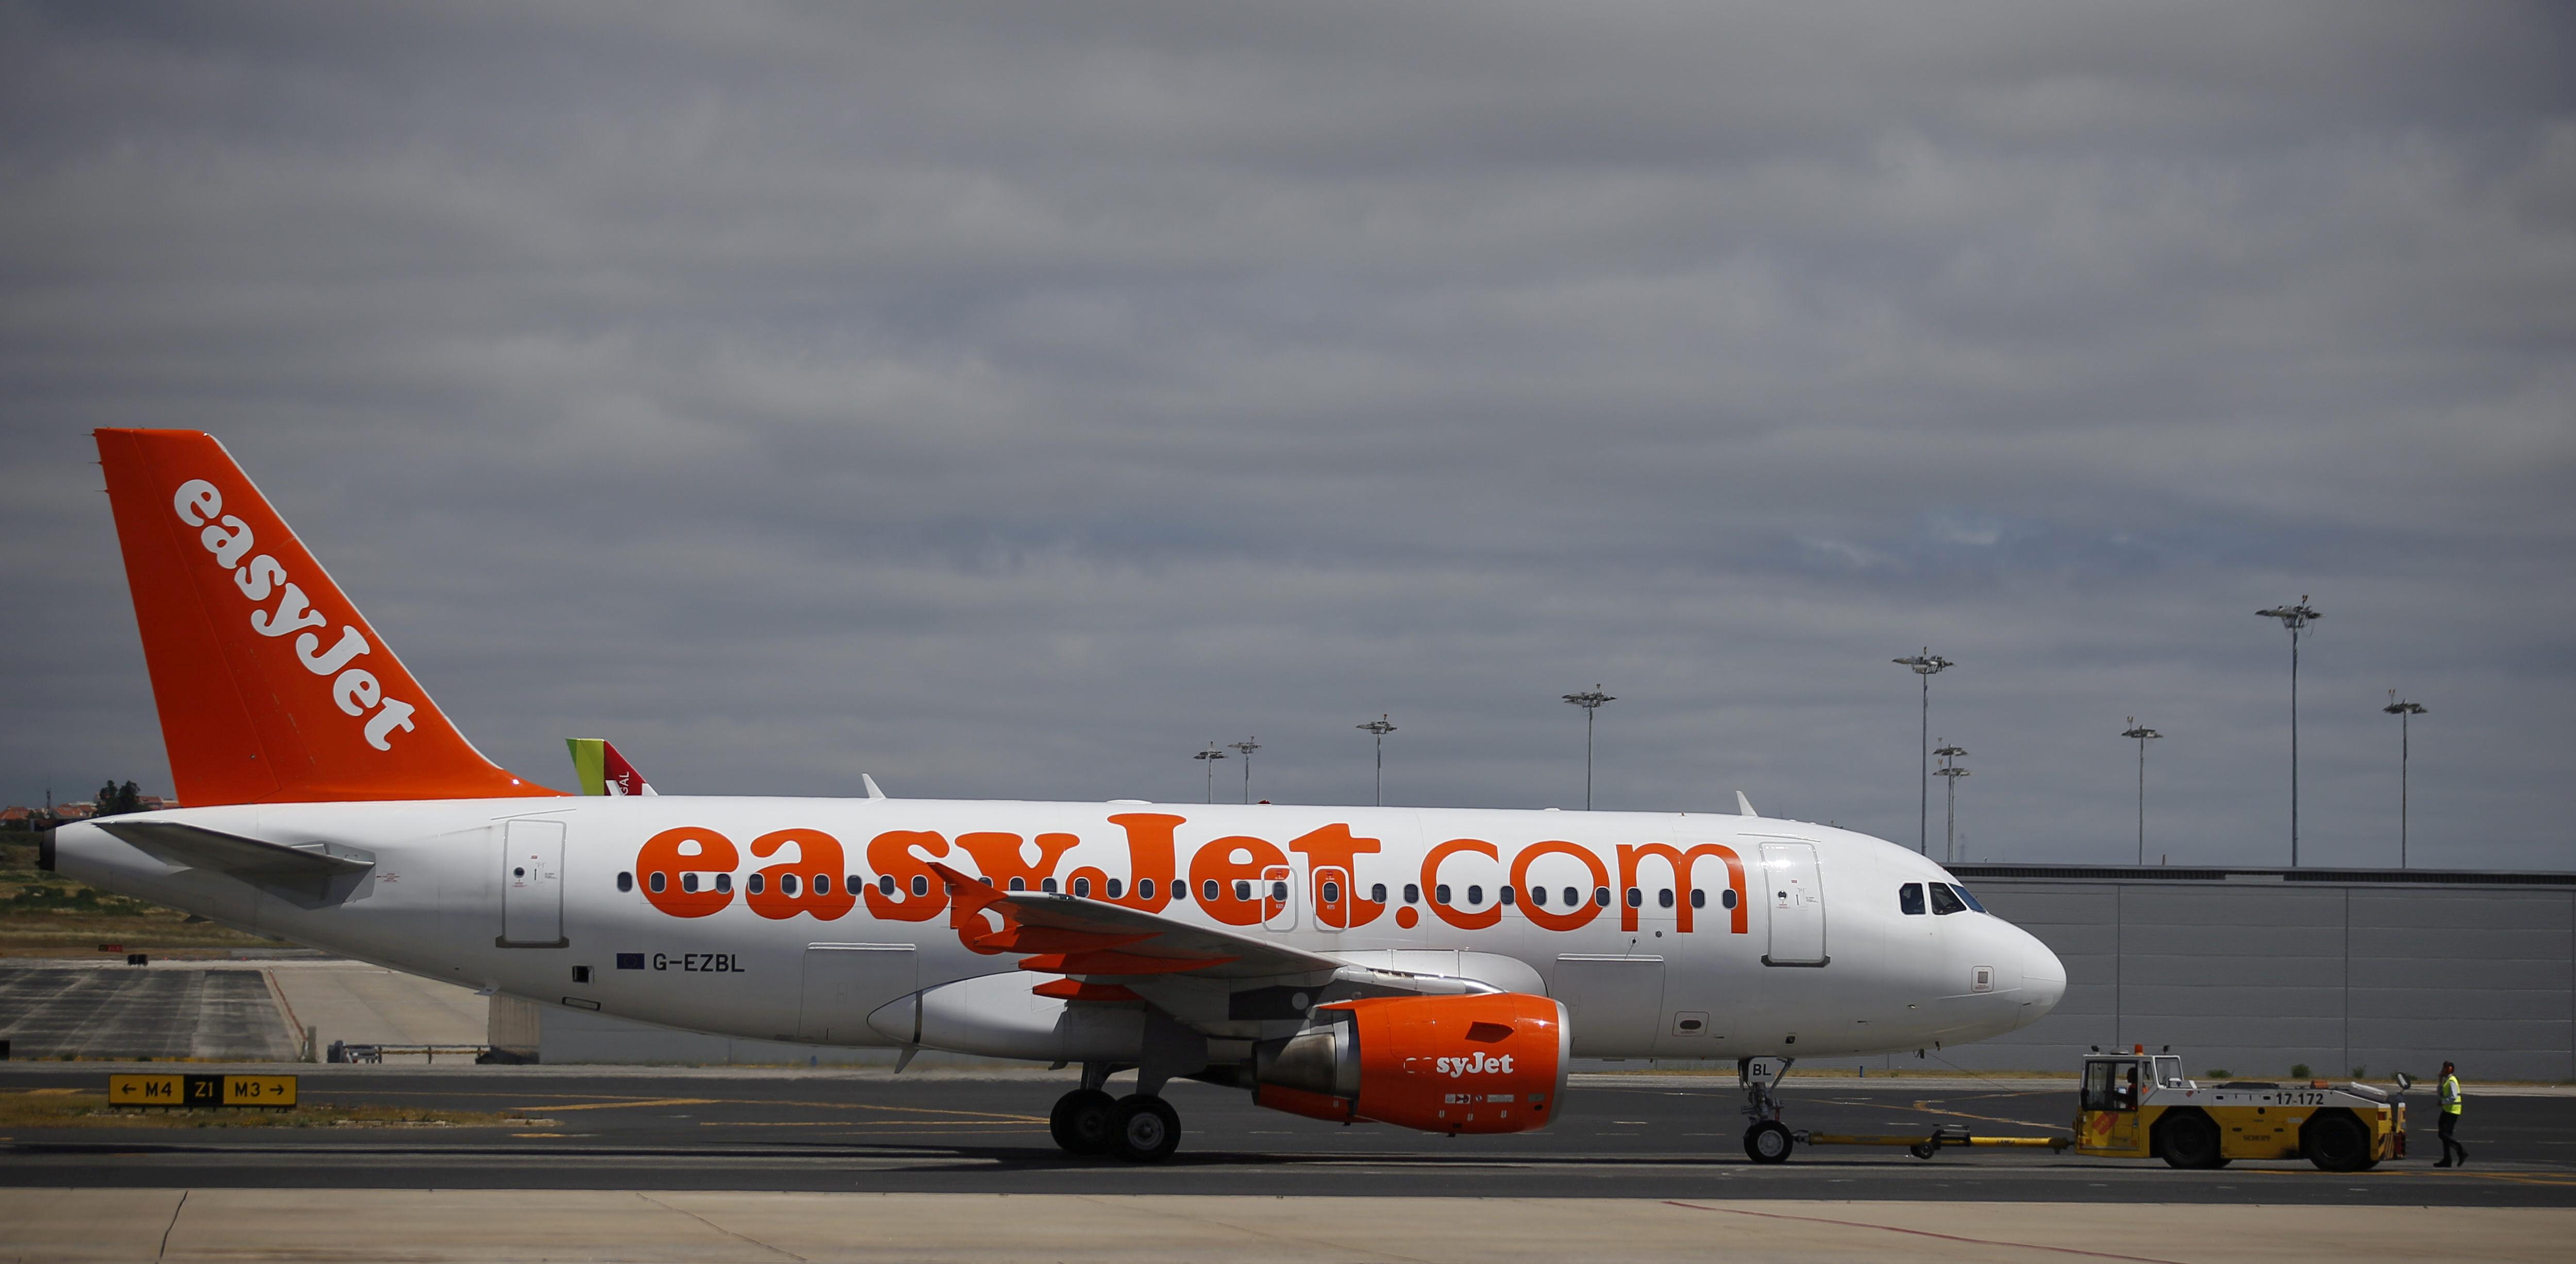 Easy Jet: Αυξήσεις πάνω από 600% σε κρατήσεις και όλοι θέλουν Κρήτη!